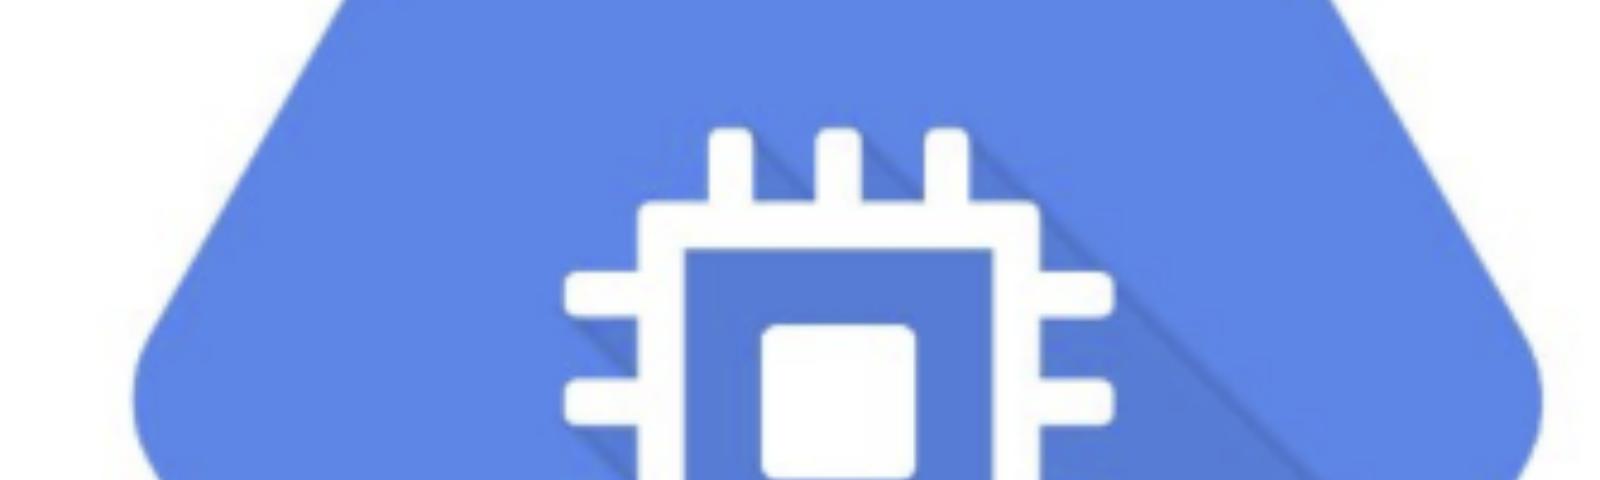 Google compute engine clipart jpg freeuse download Google Compute Engine – Google Cloud Platform - Community – Medium jpg freeuse download